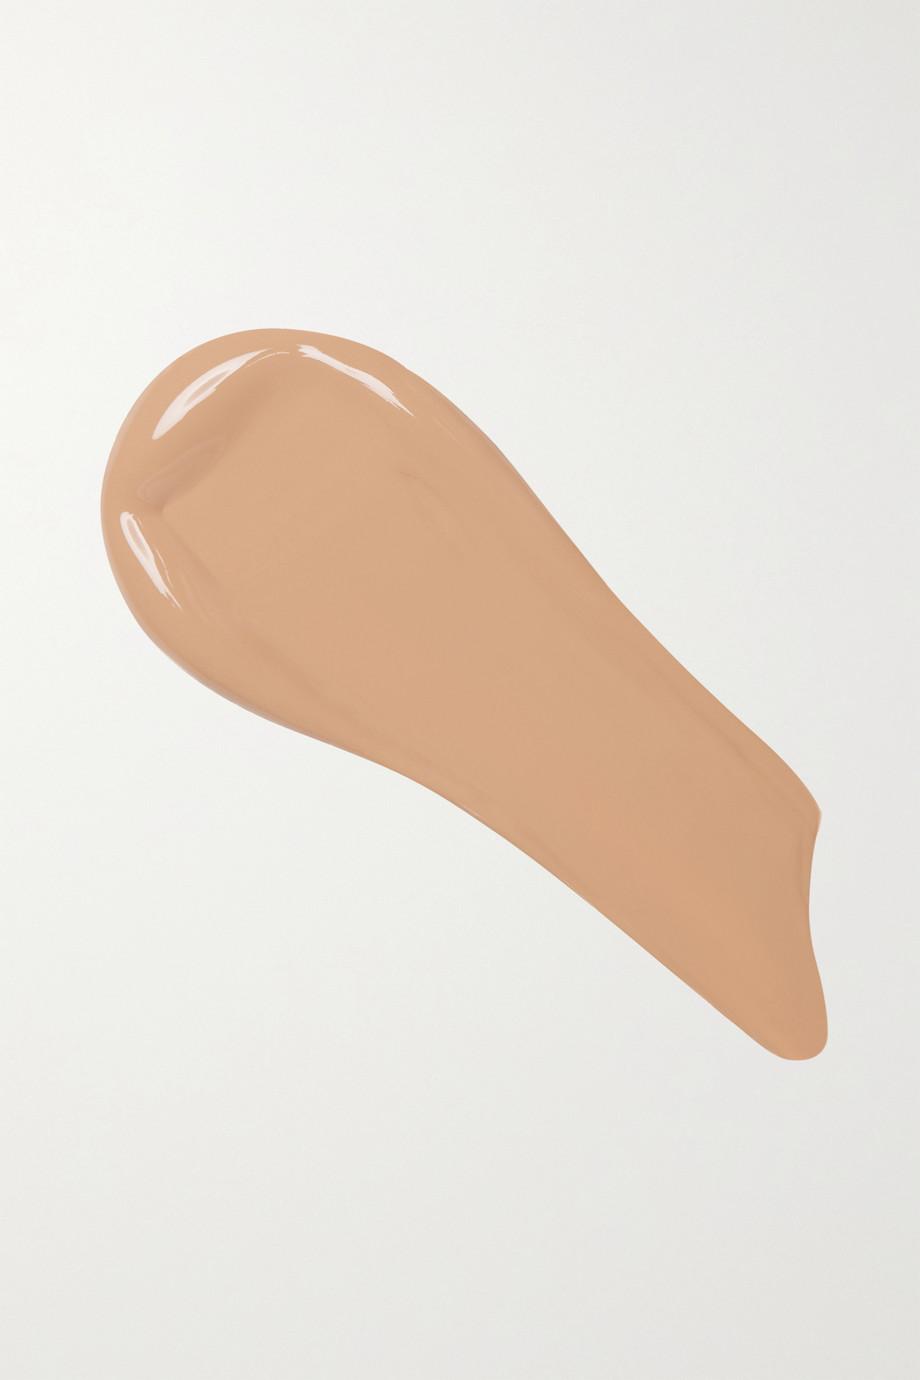 Surratt Beauty Dew Drop Foundation - 4, 19ml